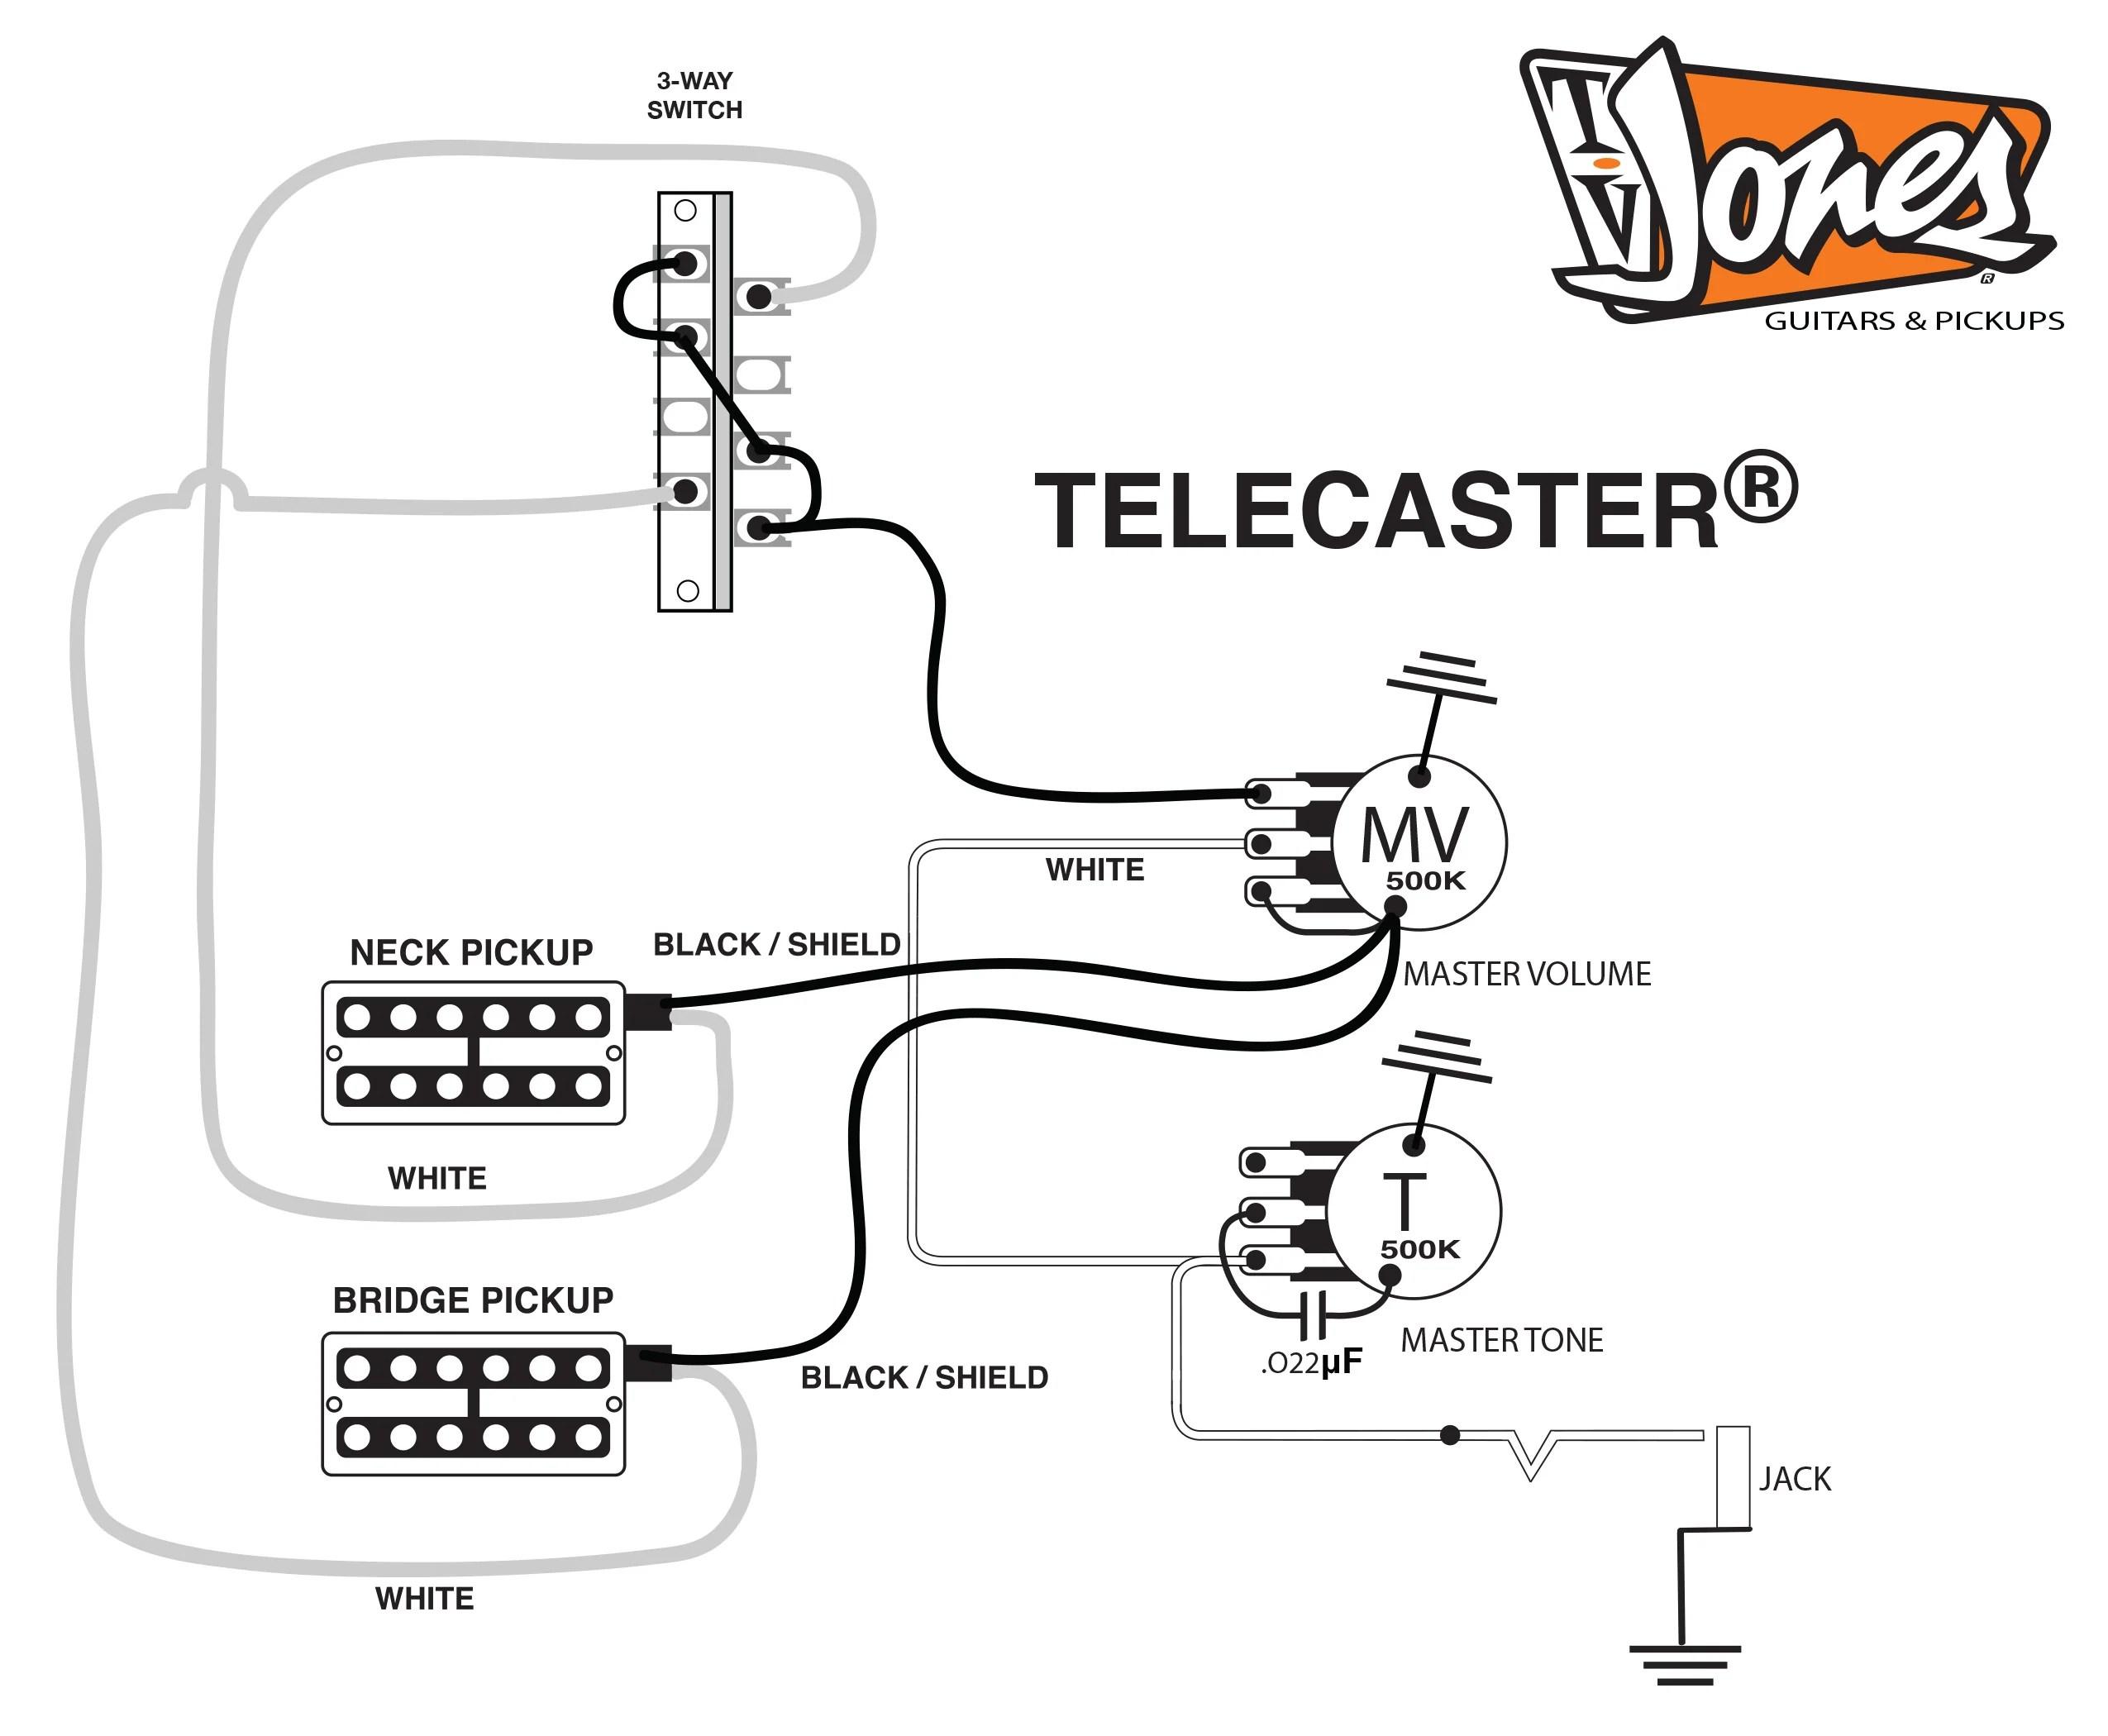 TV Jones Product Dimensions